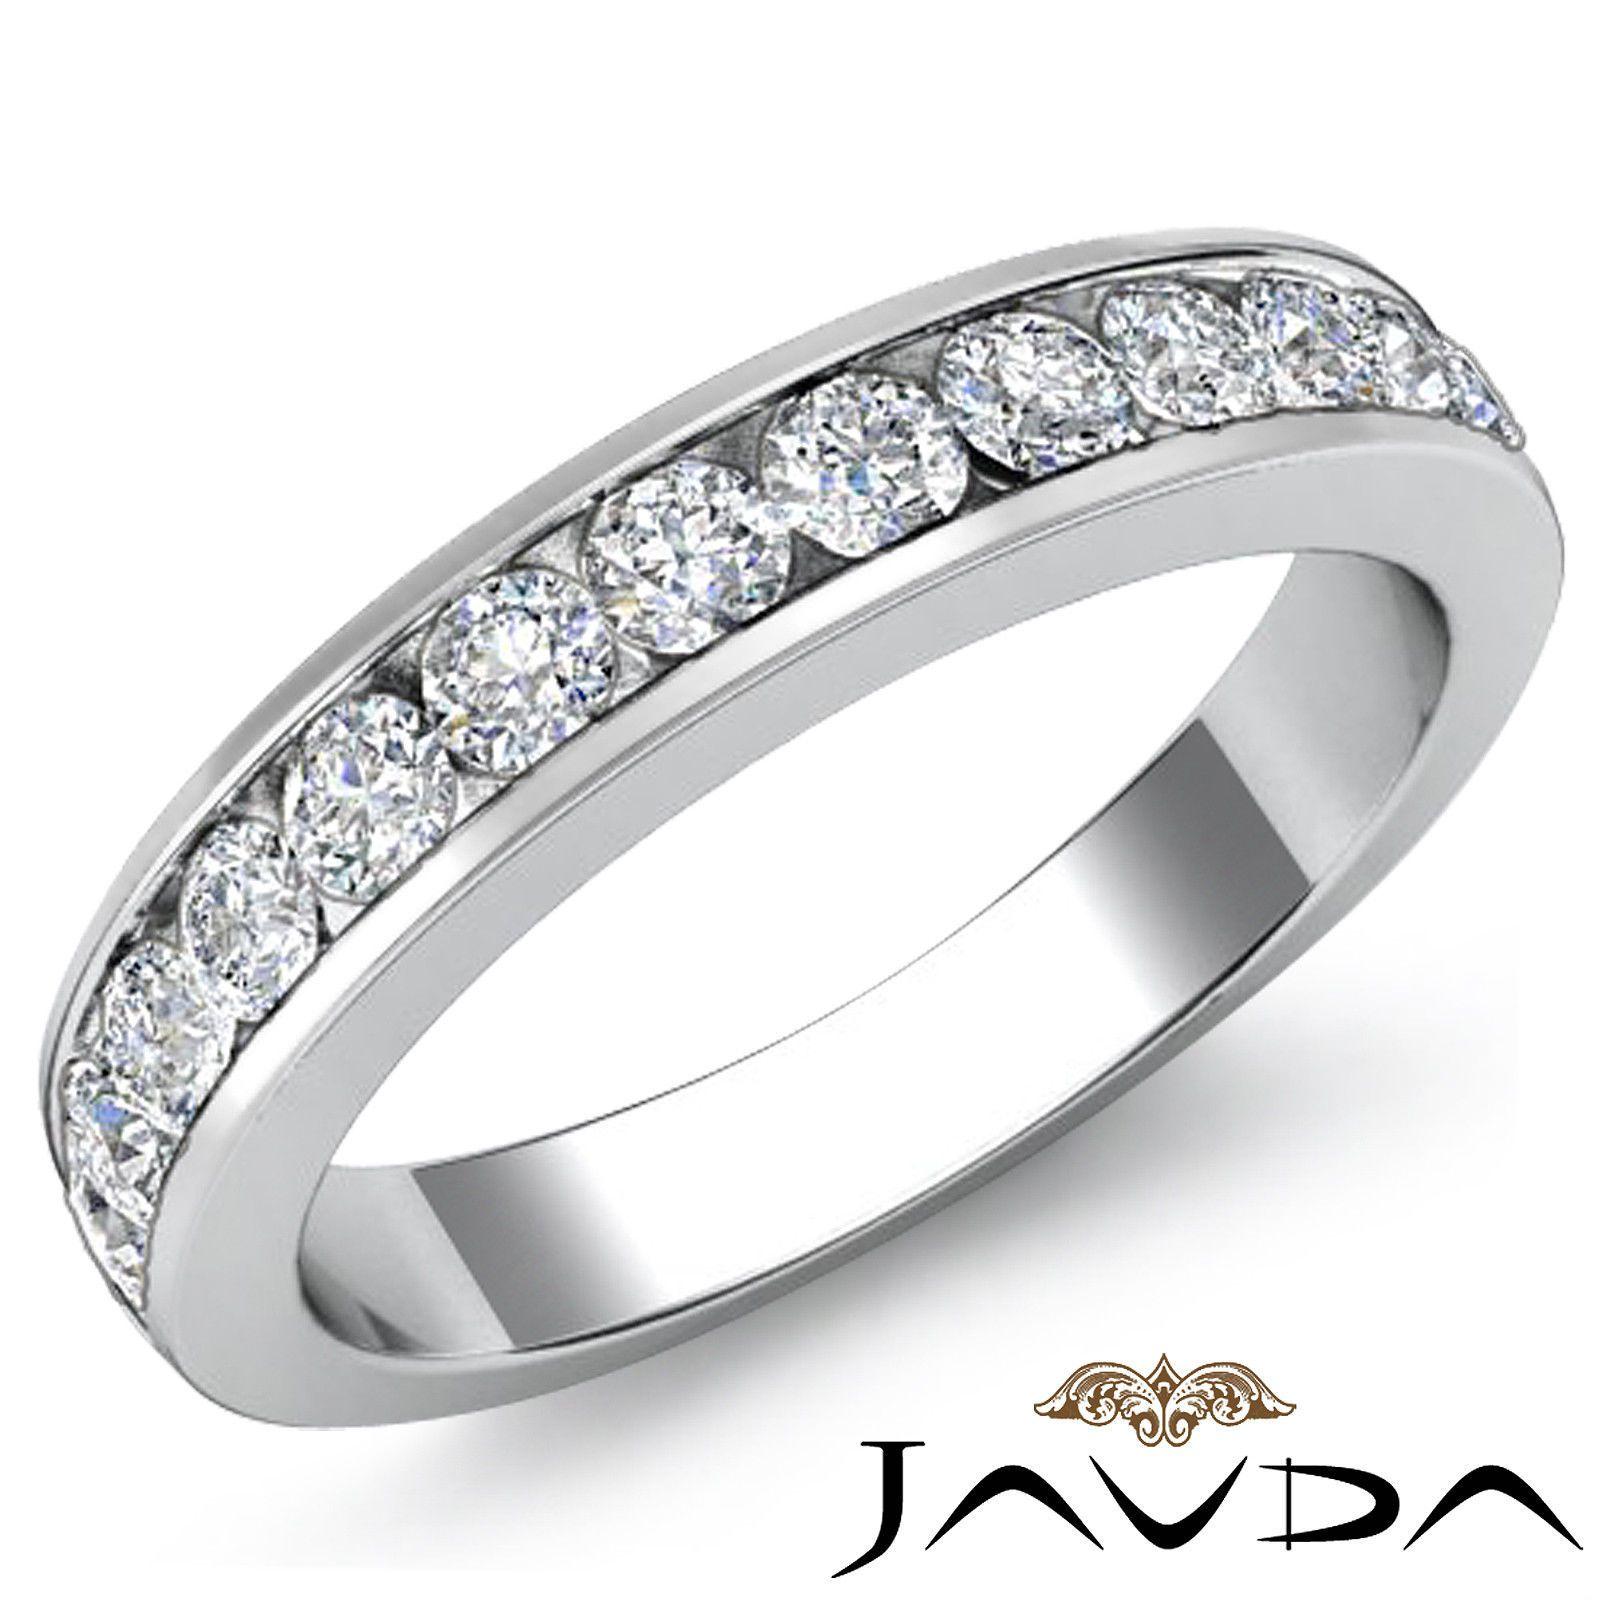 Womens Half Wedding Band Channel Set Diamond 2.75mm Ring